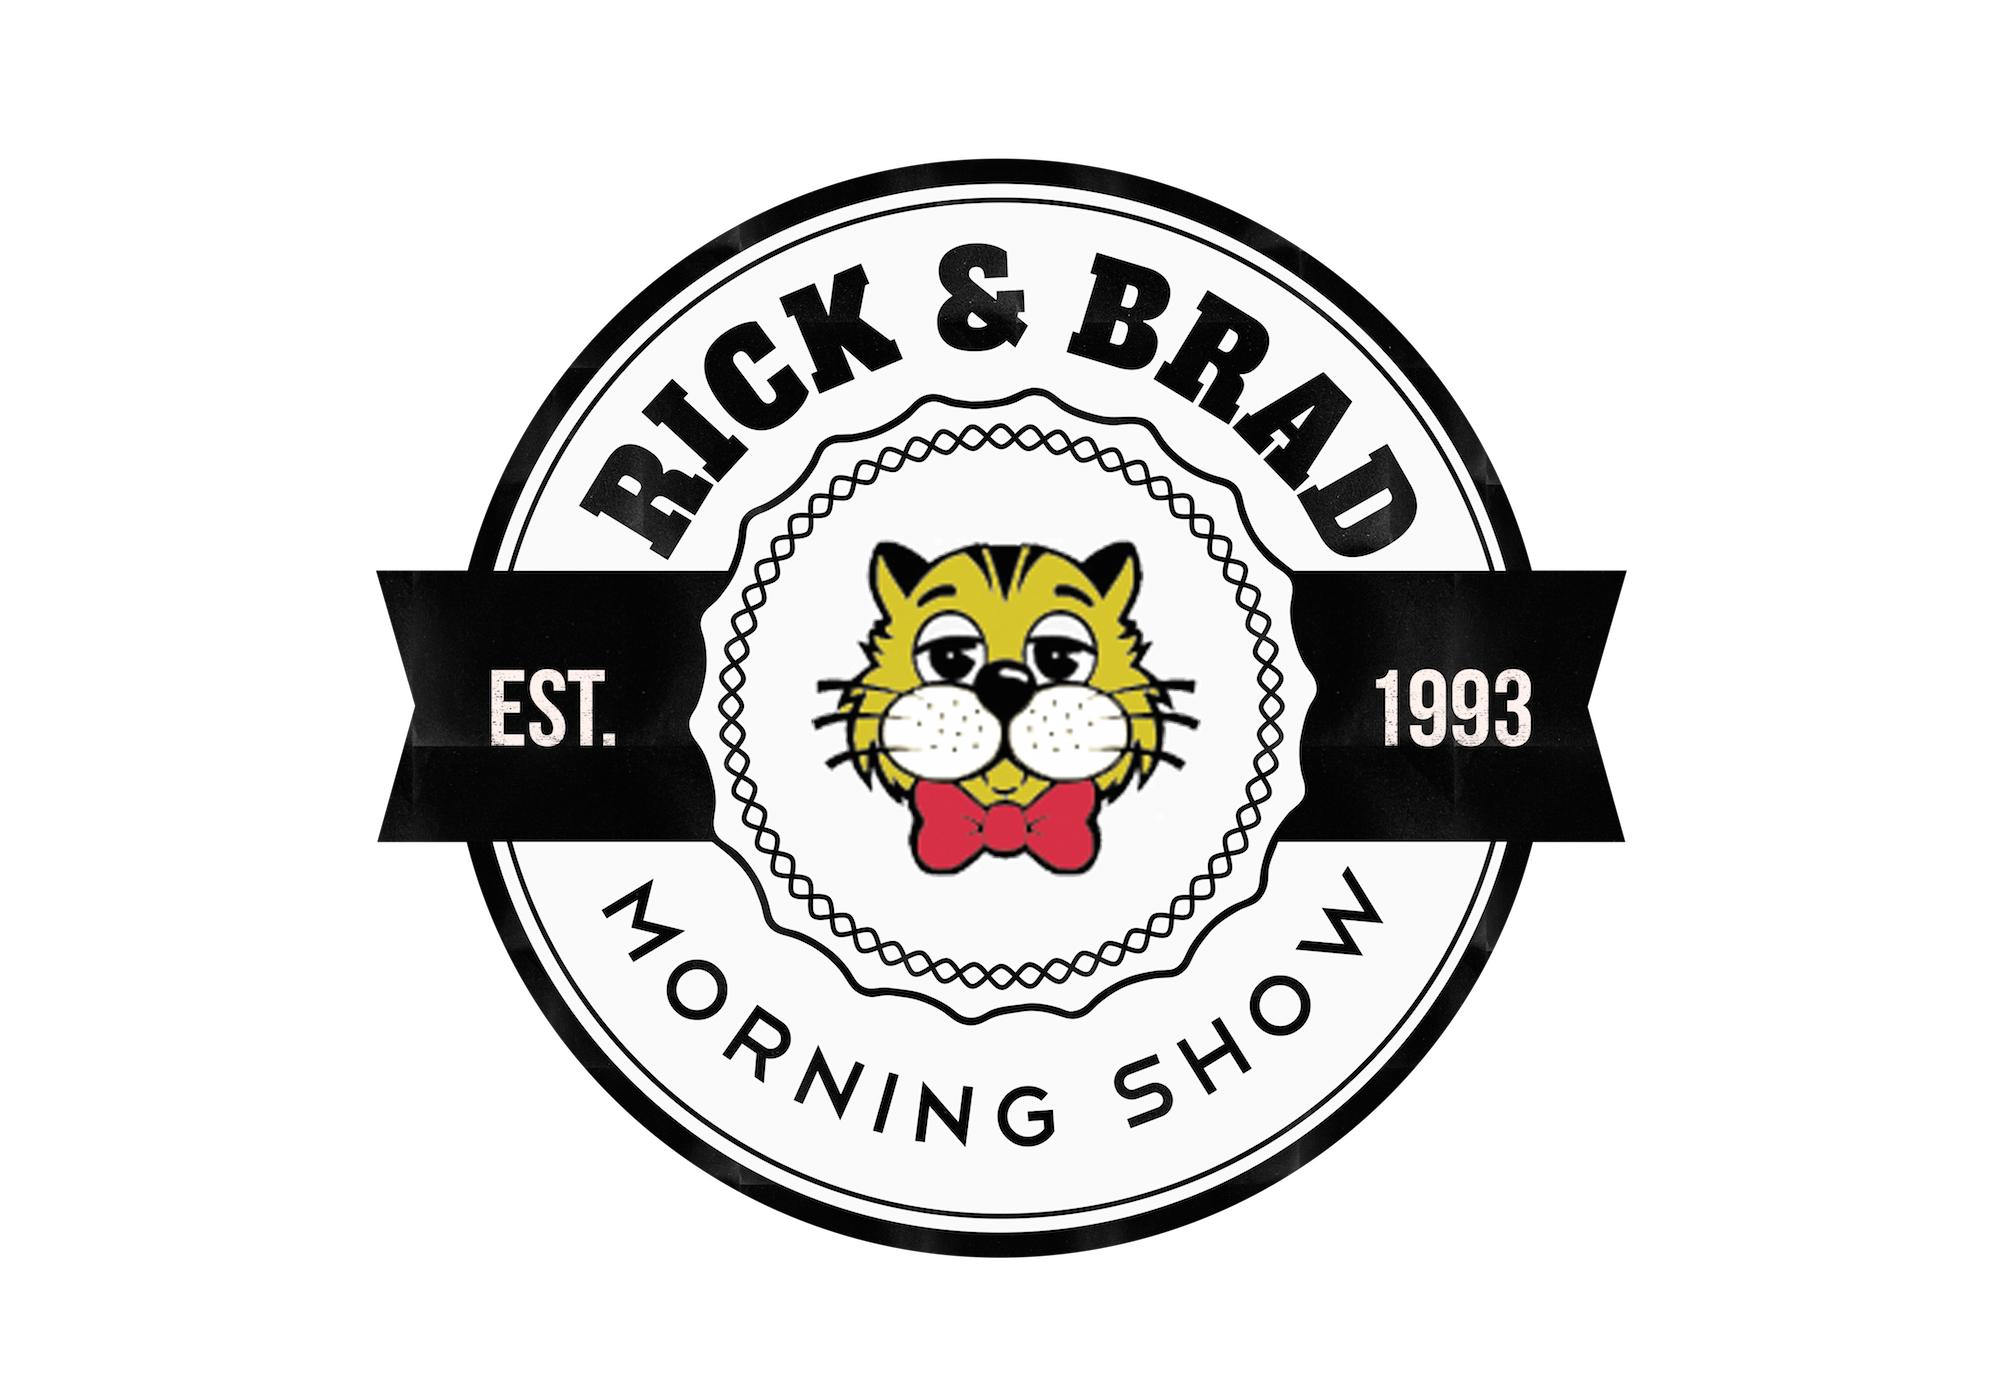 RICK & BRAD SHOW